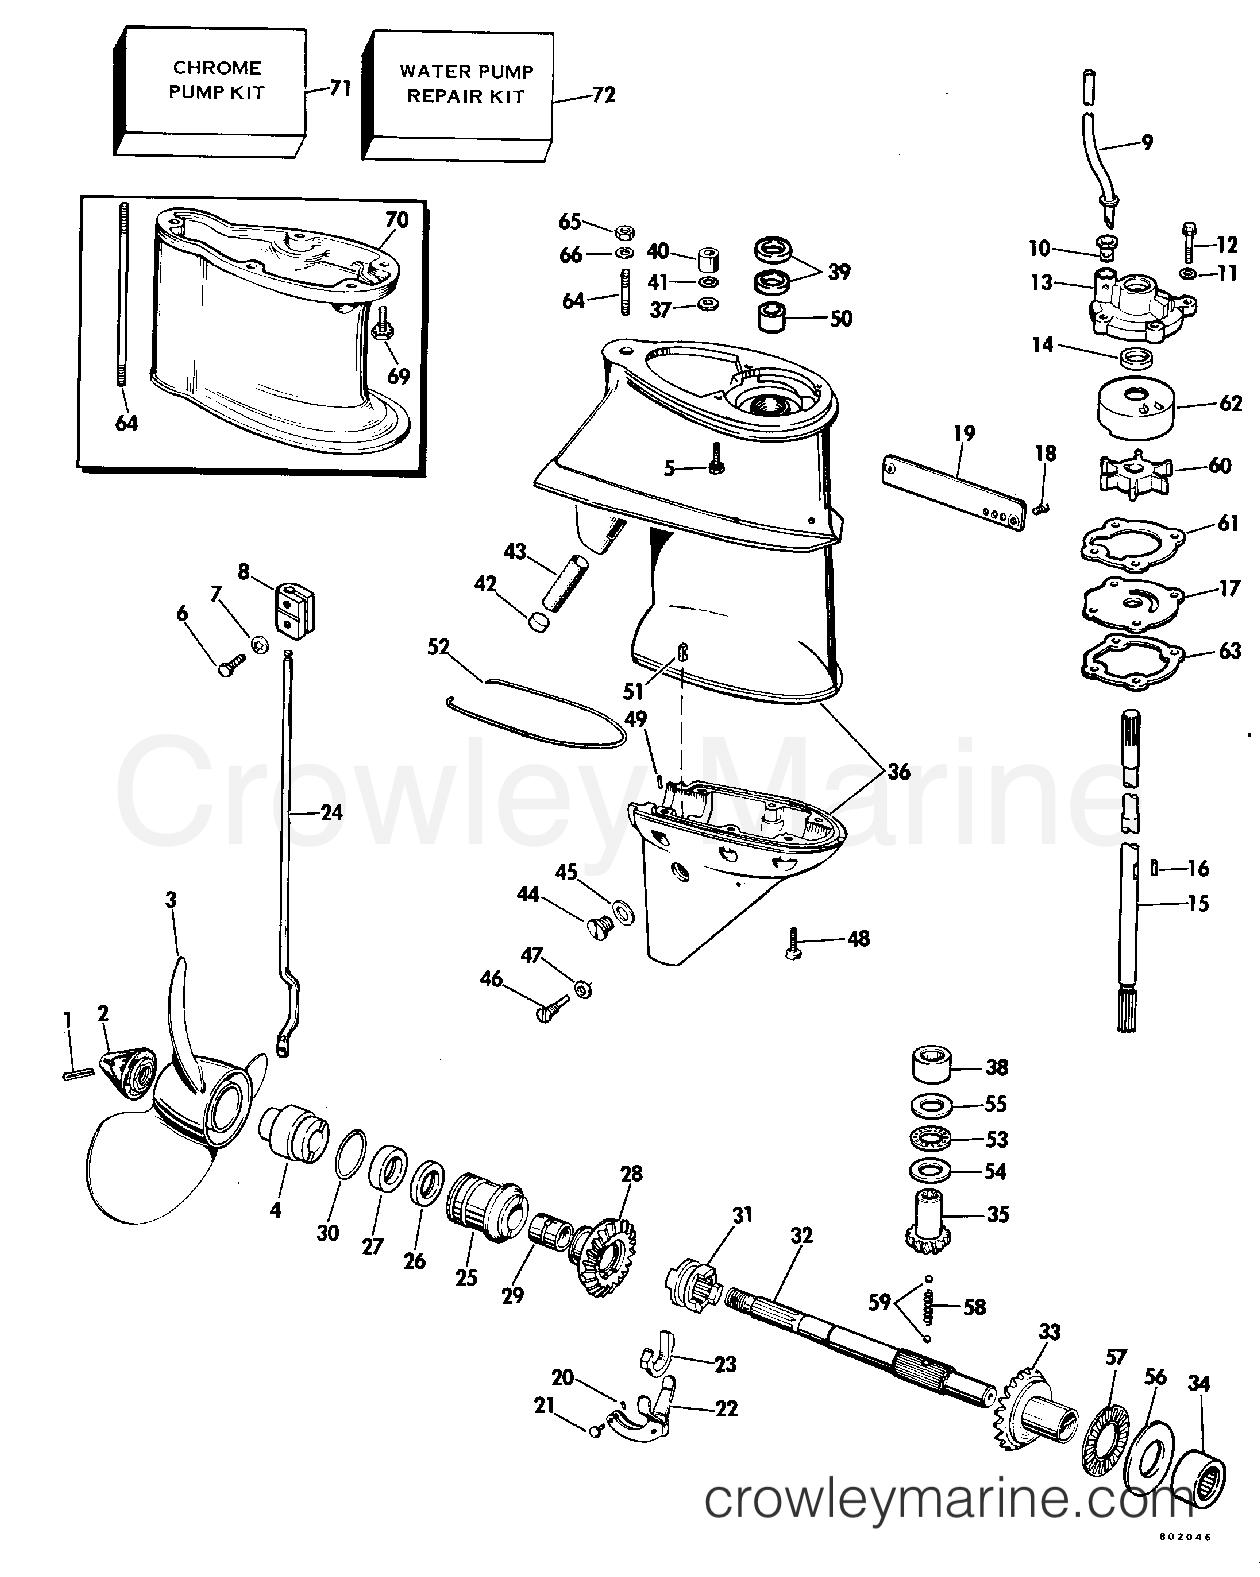 Evinrude Outboards 2 Stroke | Wiring Diagram Database